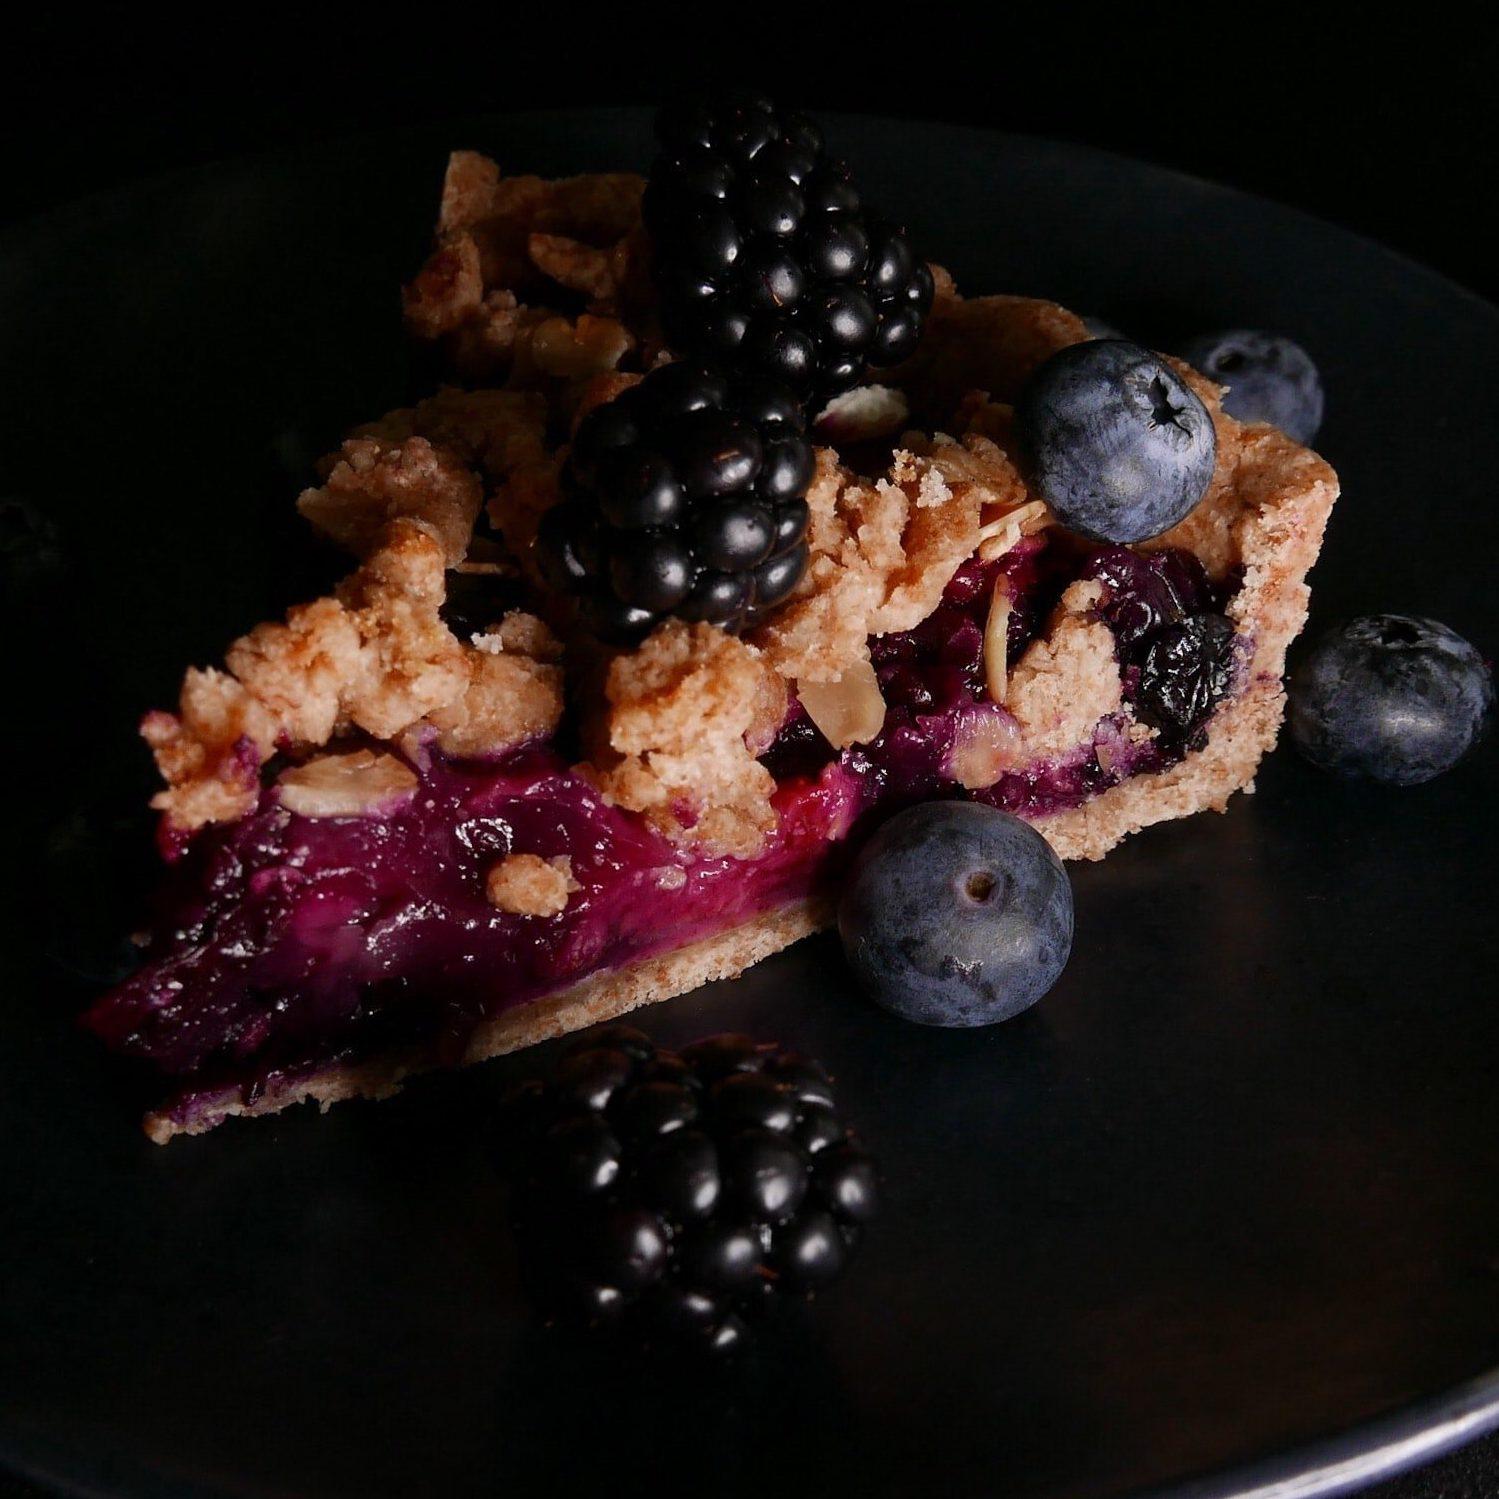 Berry Pie photo by Irina via Unsplash